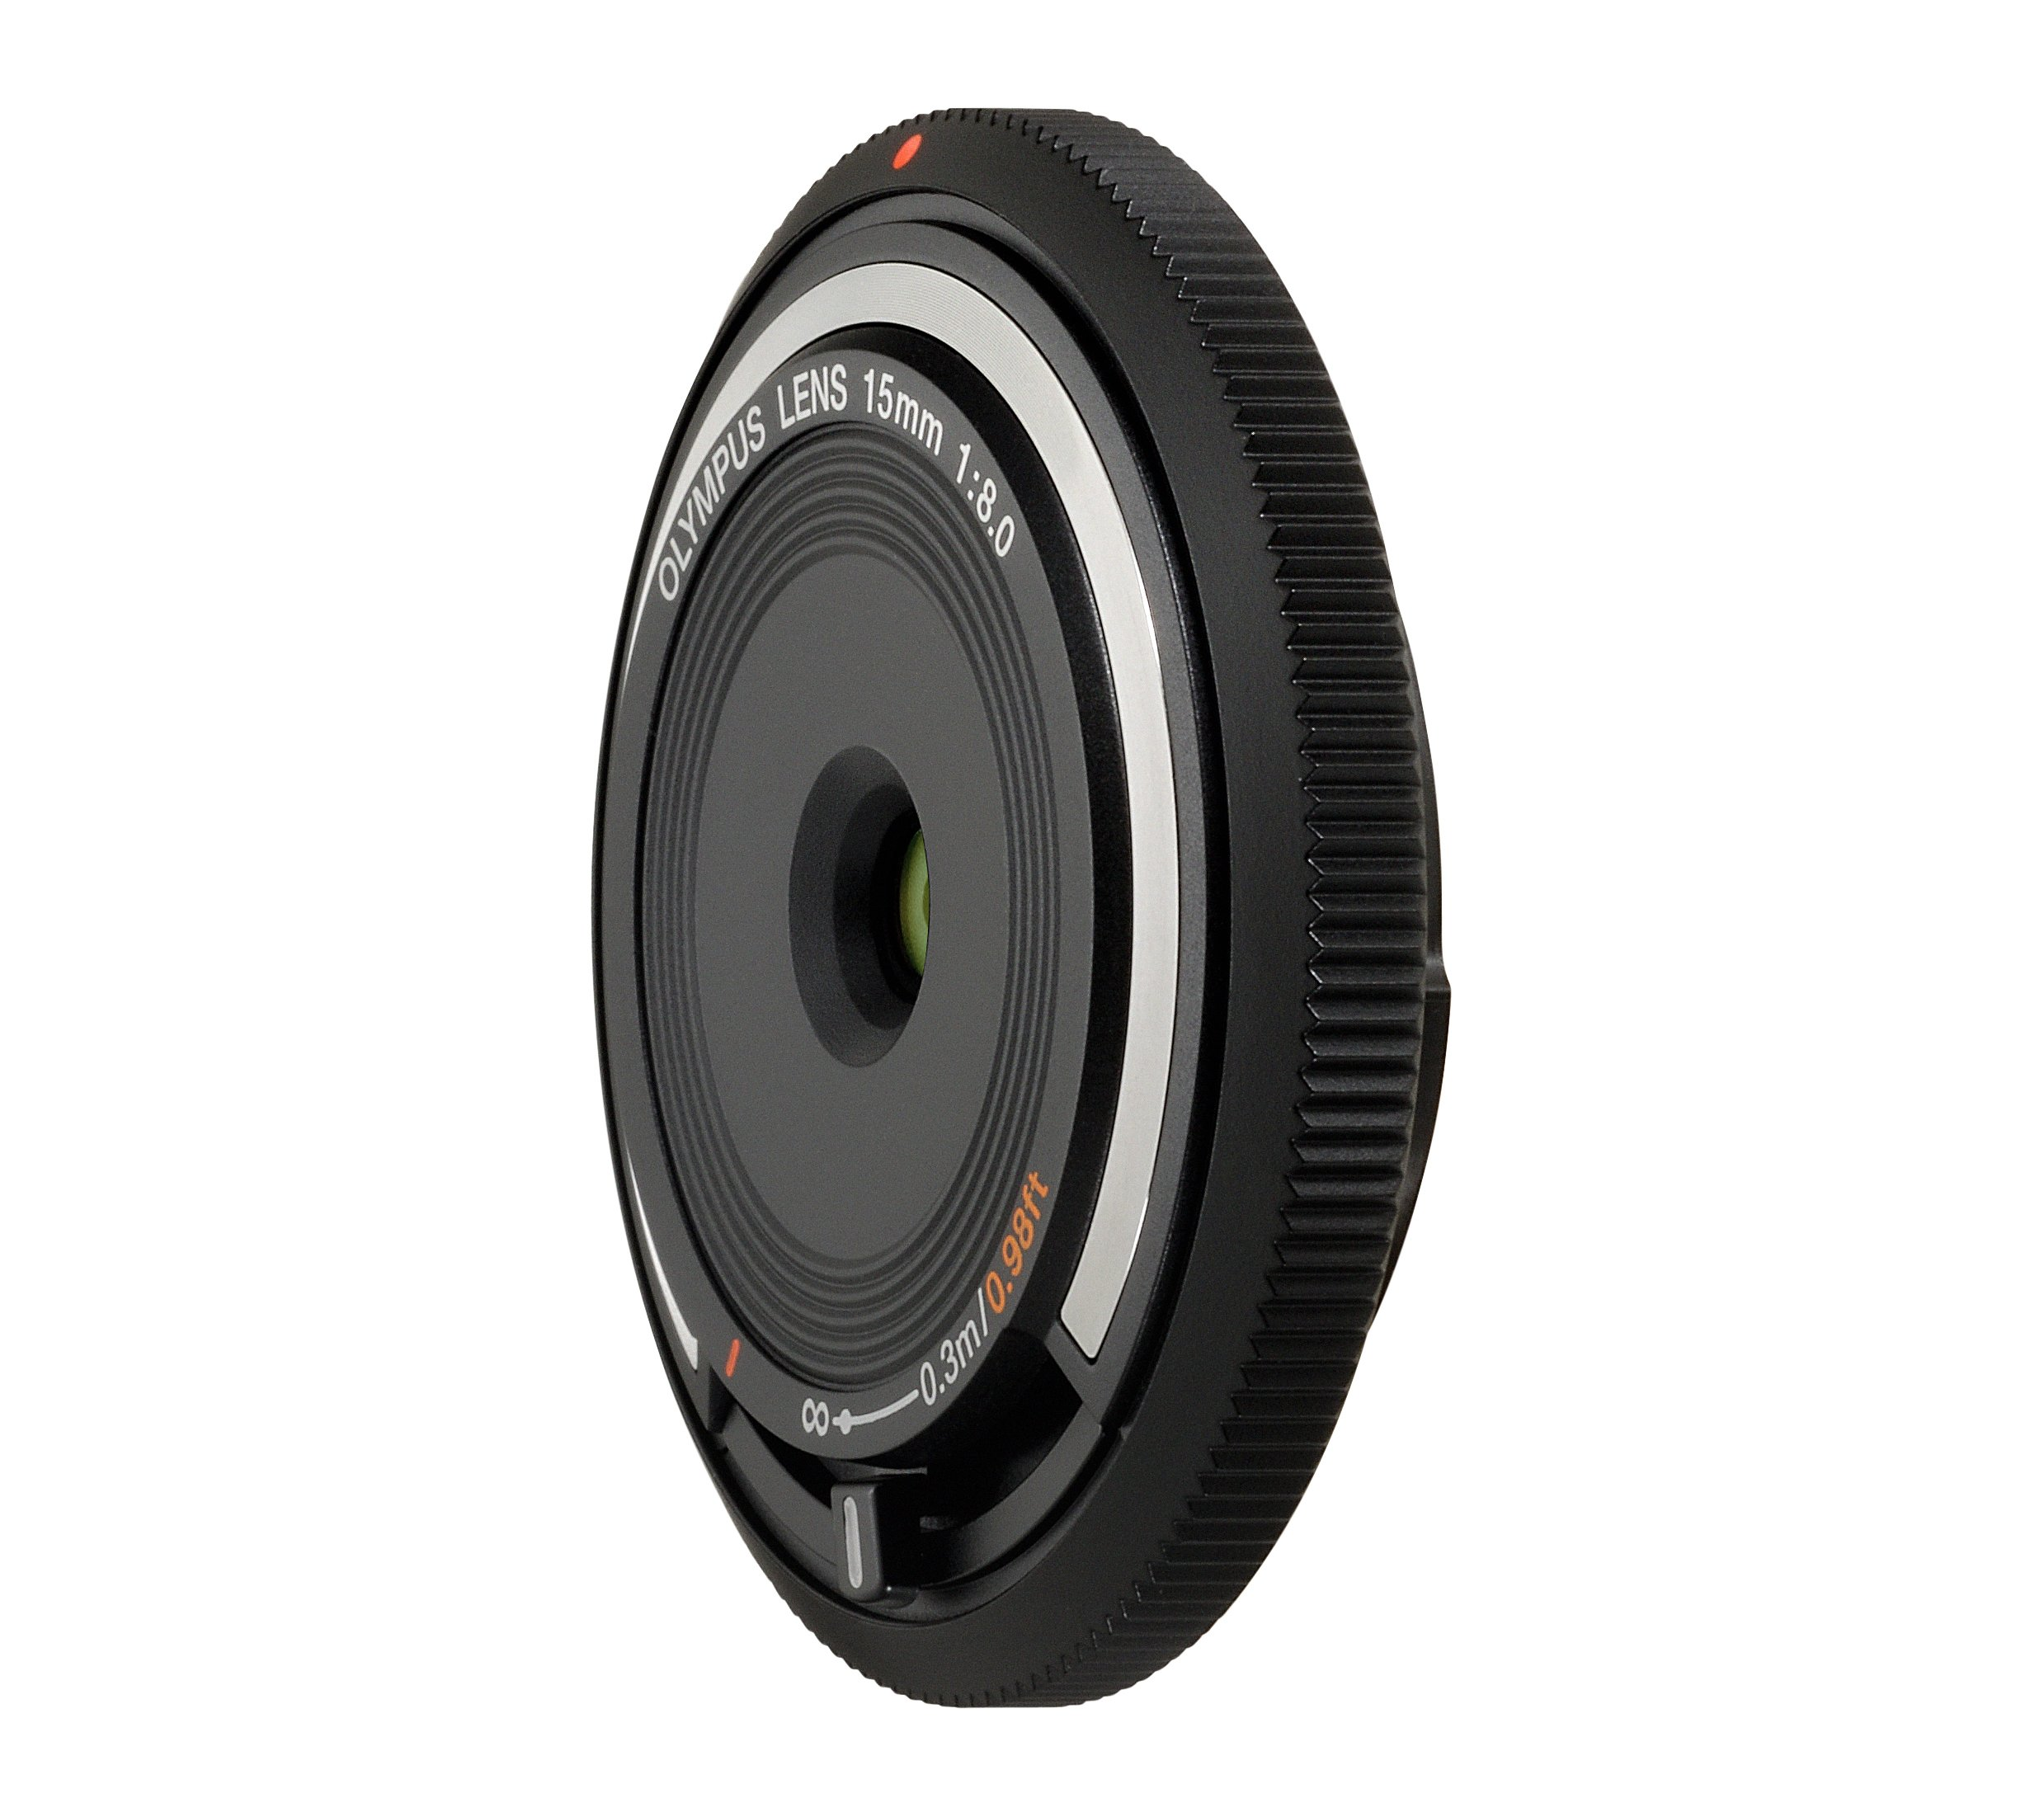 Olympus BCL-15mm f8.0 Body Lens Cap for Olympus/Panasonic Micro 4/3 Cameras (Black) - International Version (No Warranty)